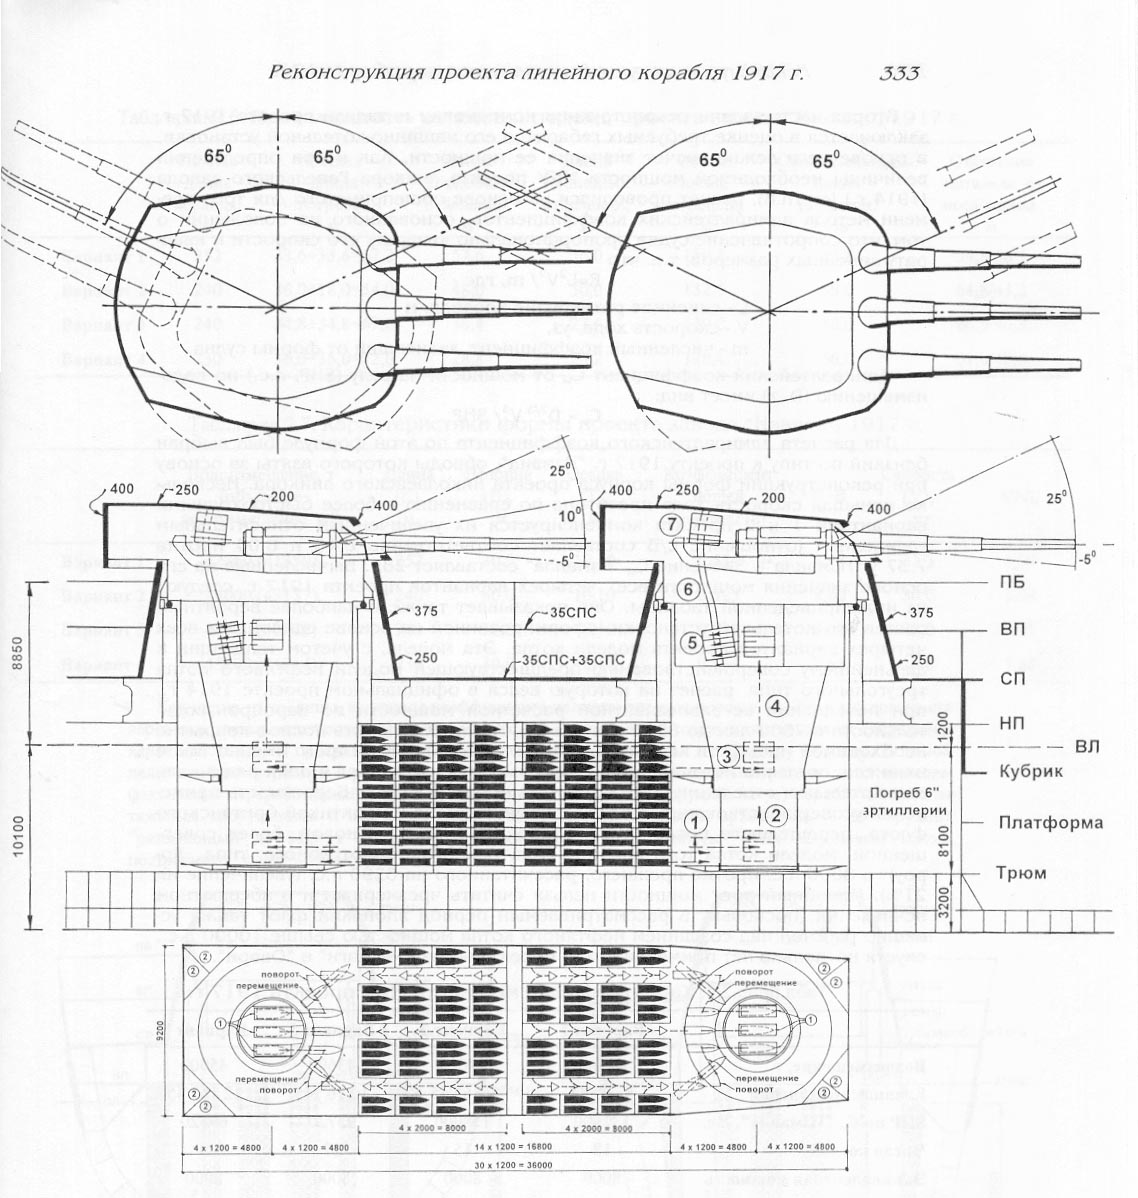 Russian 16 Inch Gun Battleship Projects